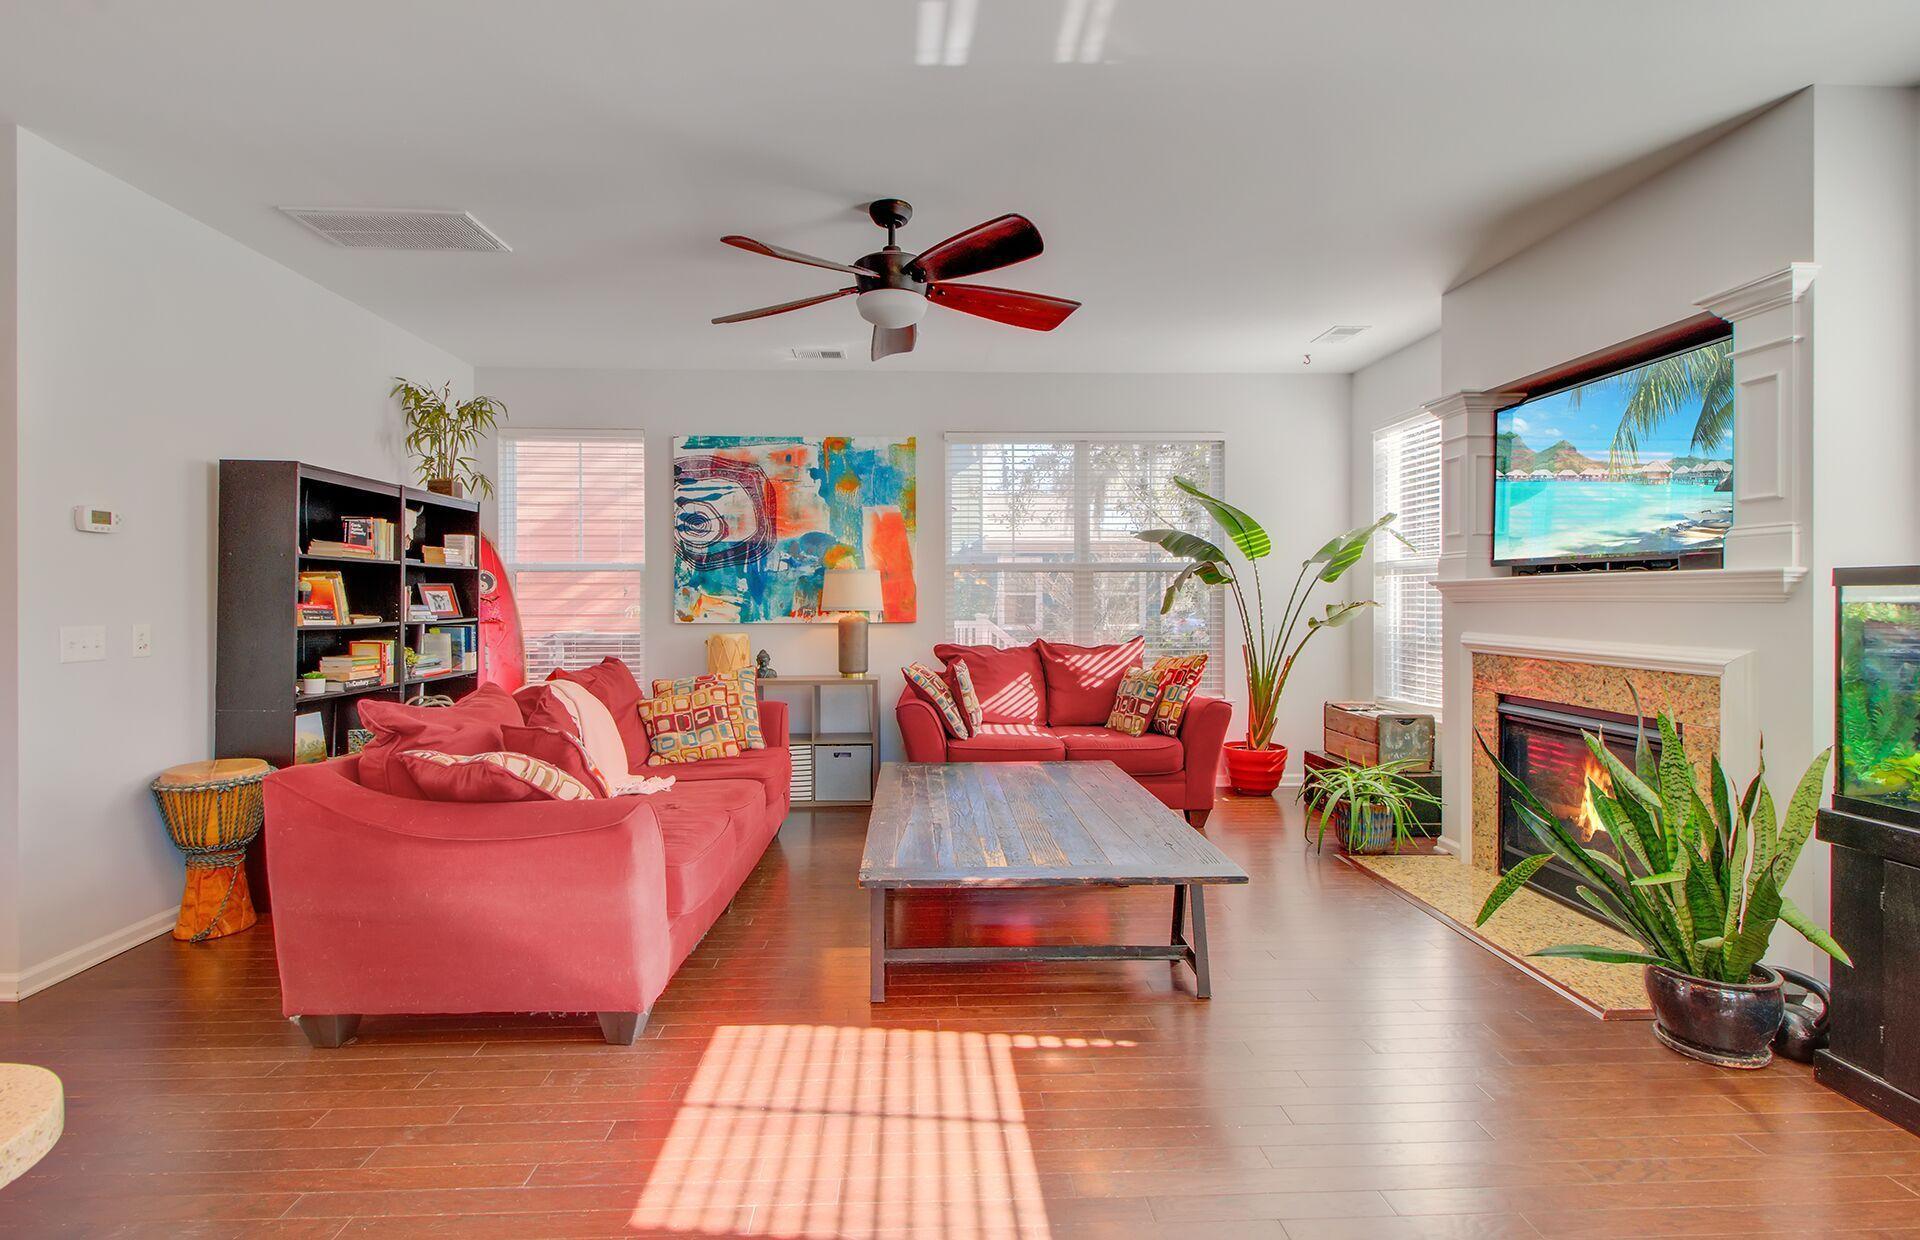 Oak Terrace Preserve Homes For Sale - 4967 Liberty Park, North Charleston, SC - 27